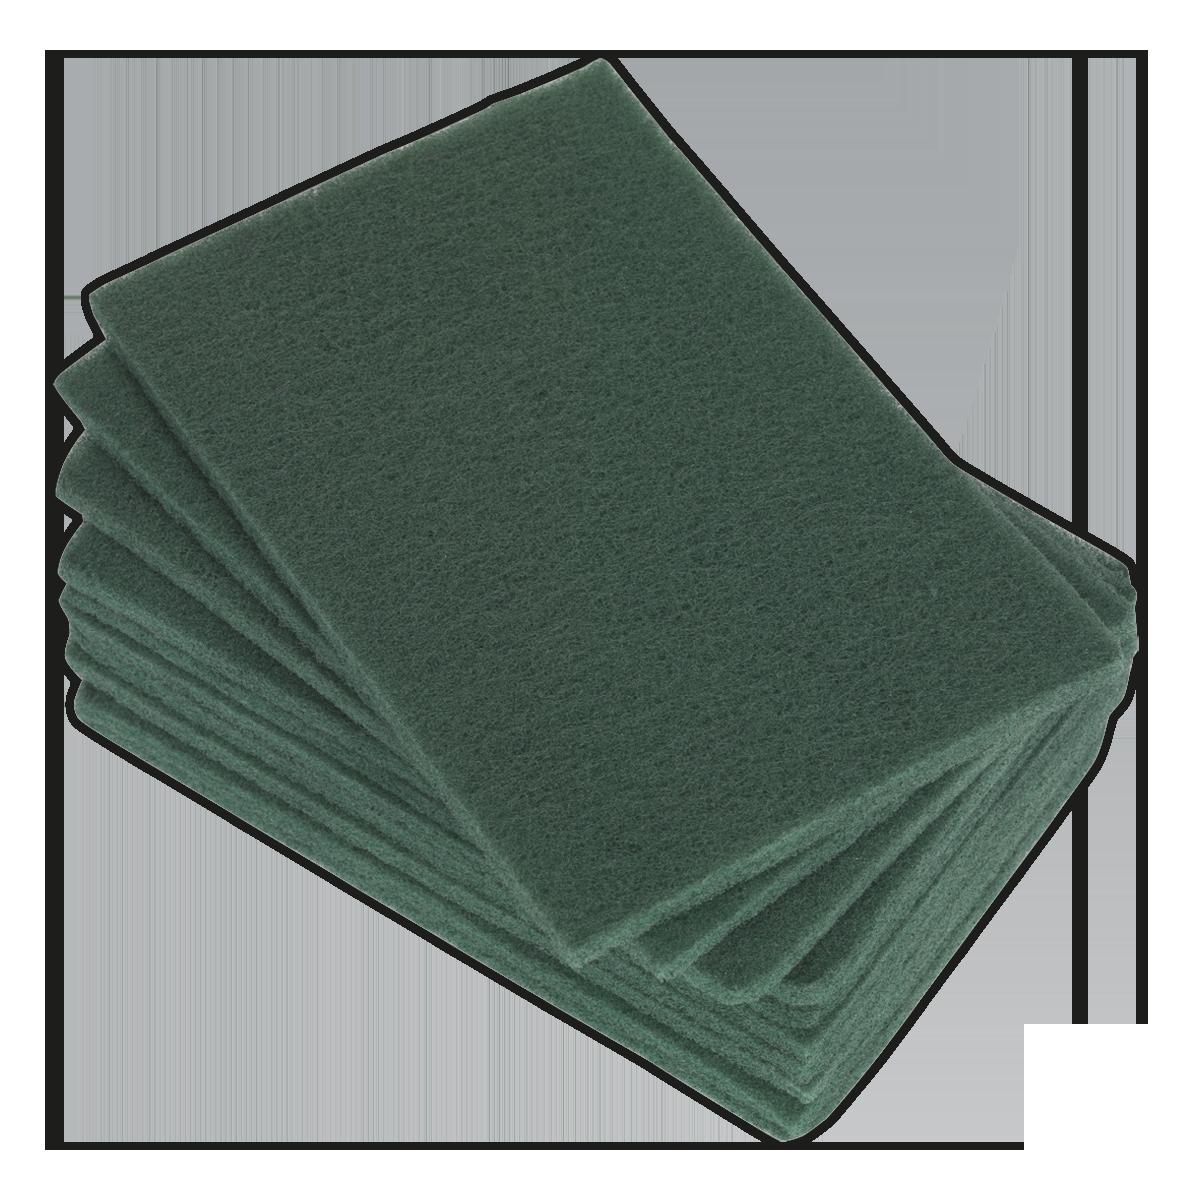 Abrasive Finishing Pad 150 x 230mm Fine Pack of 10